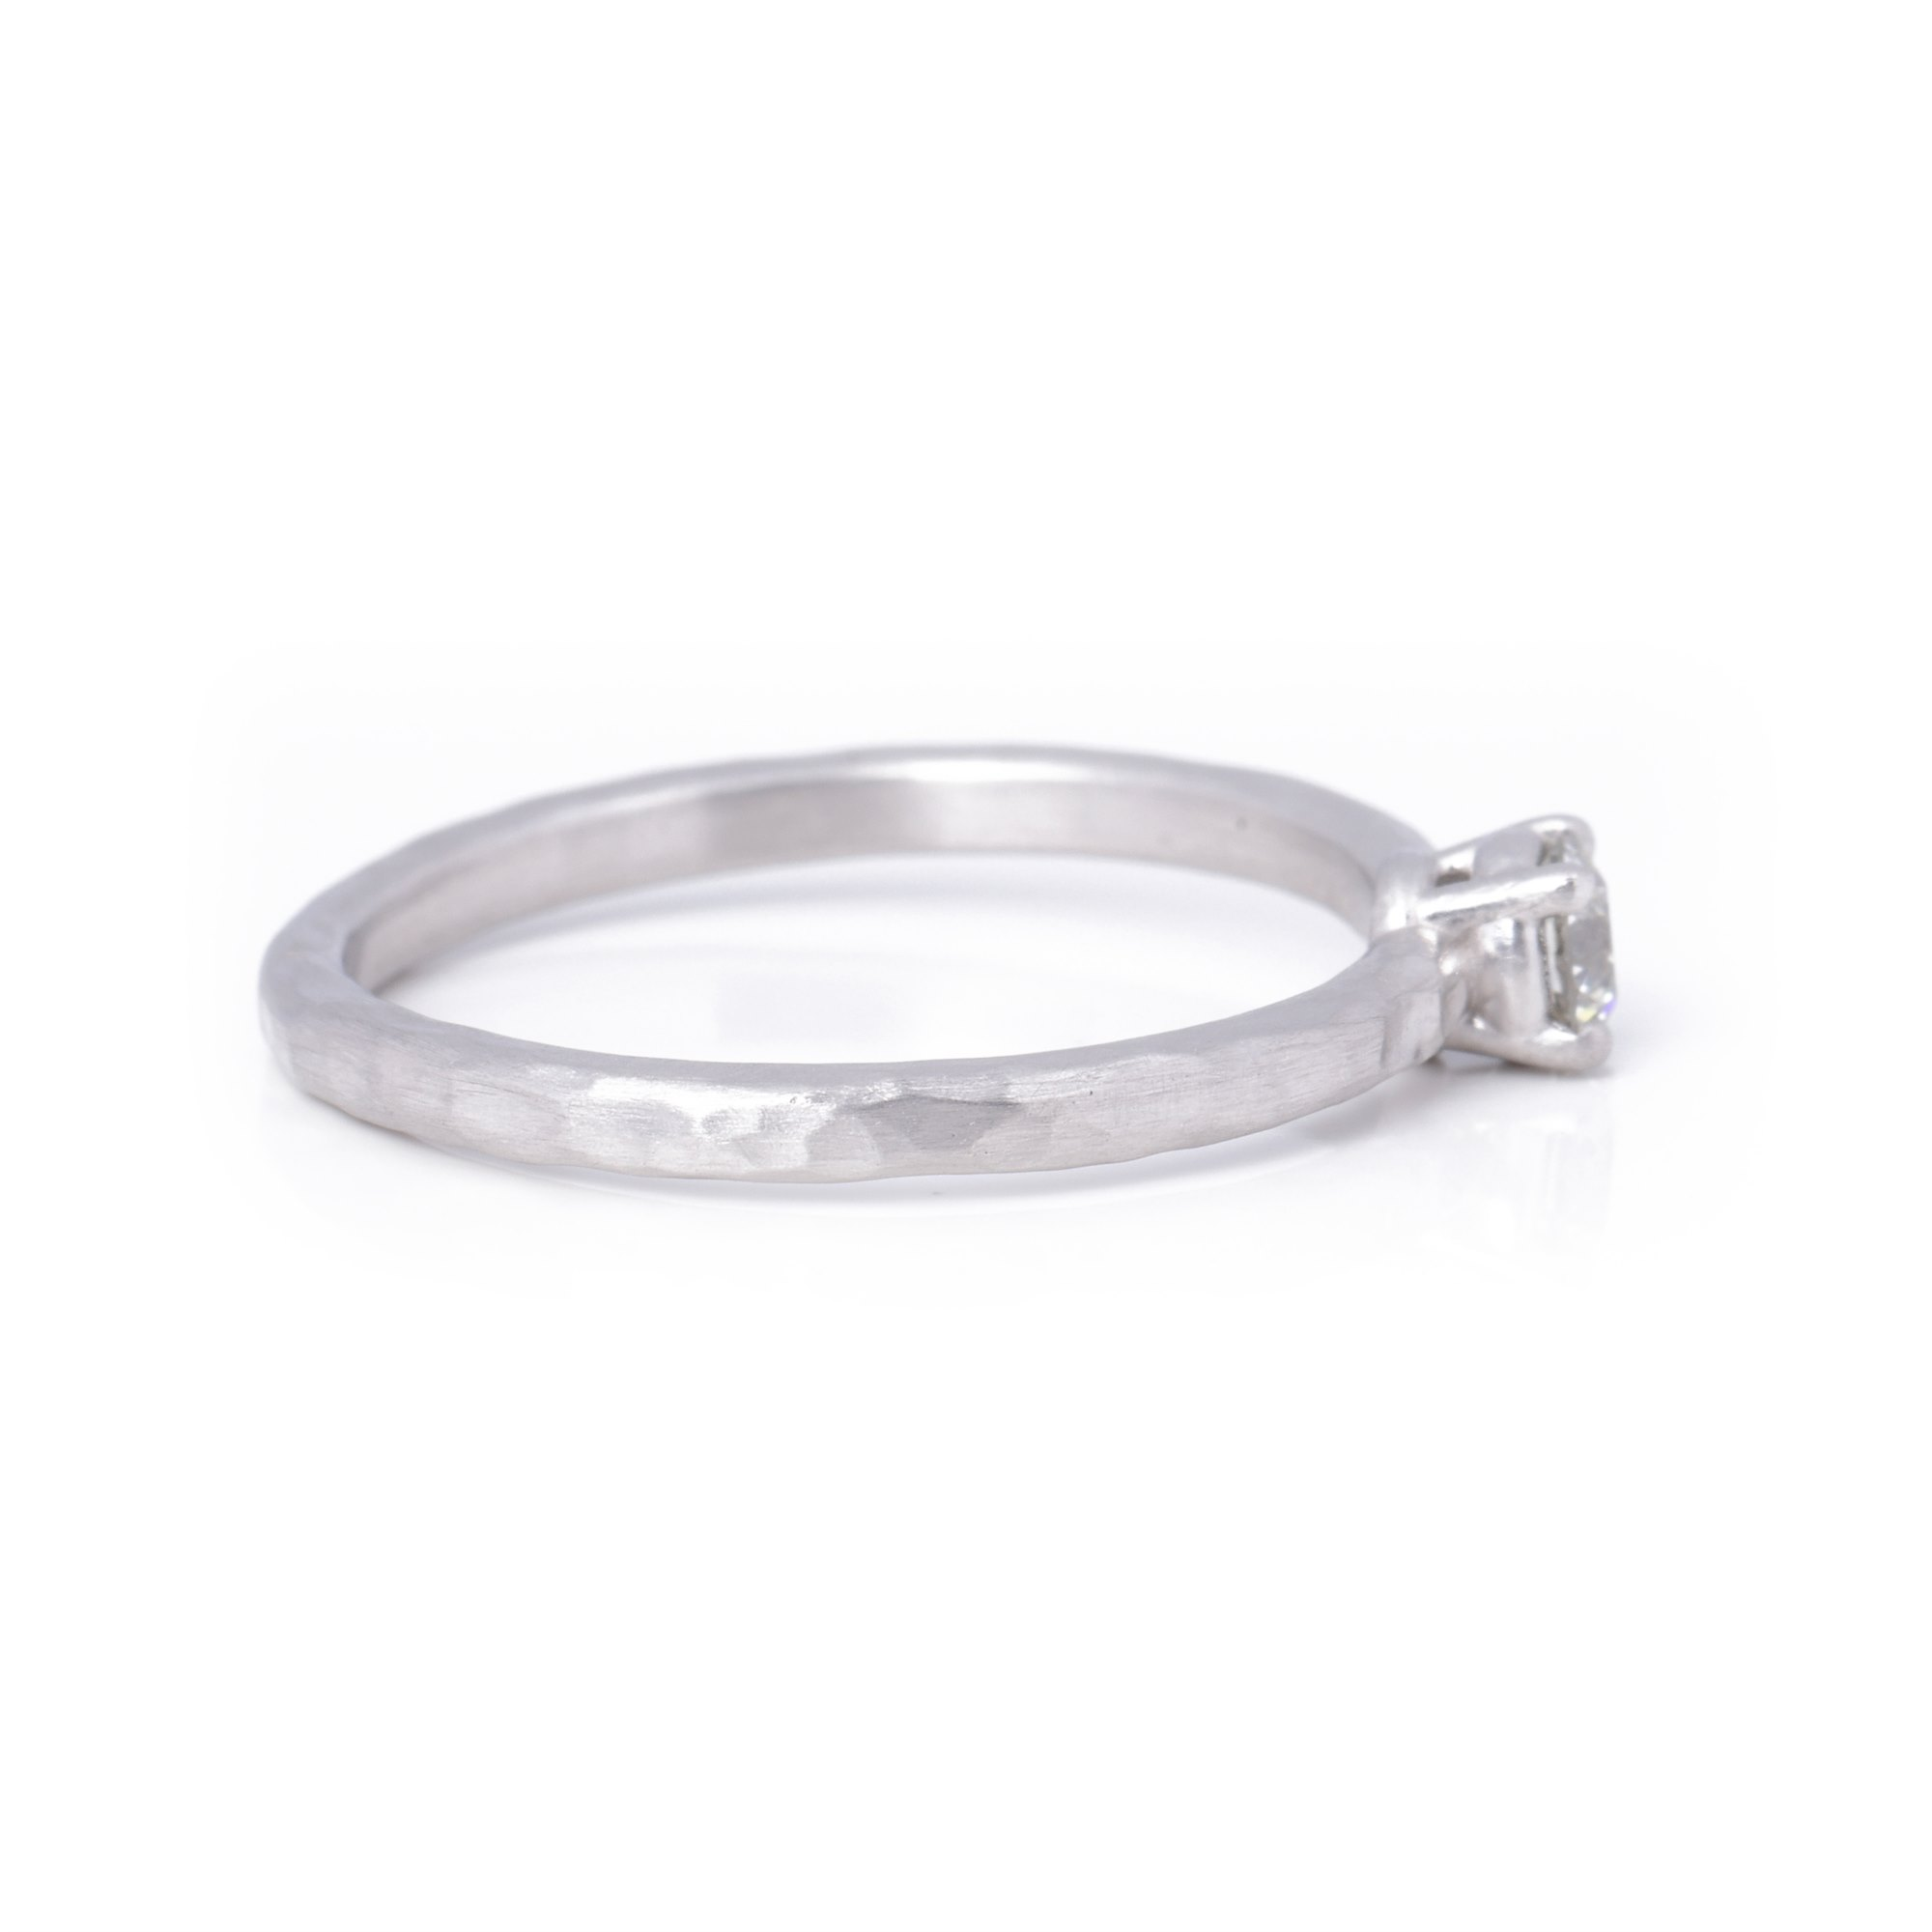 Tiffany & Co. Paloma Picasso 0.19ct Diamond Ring